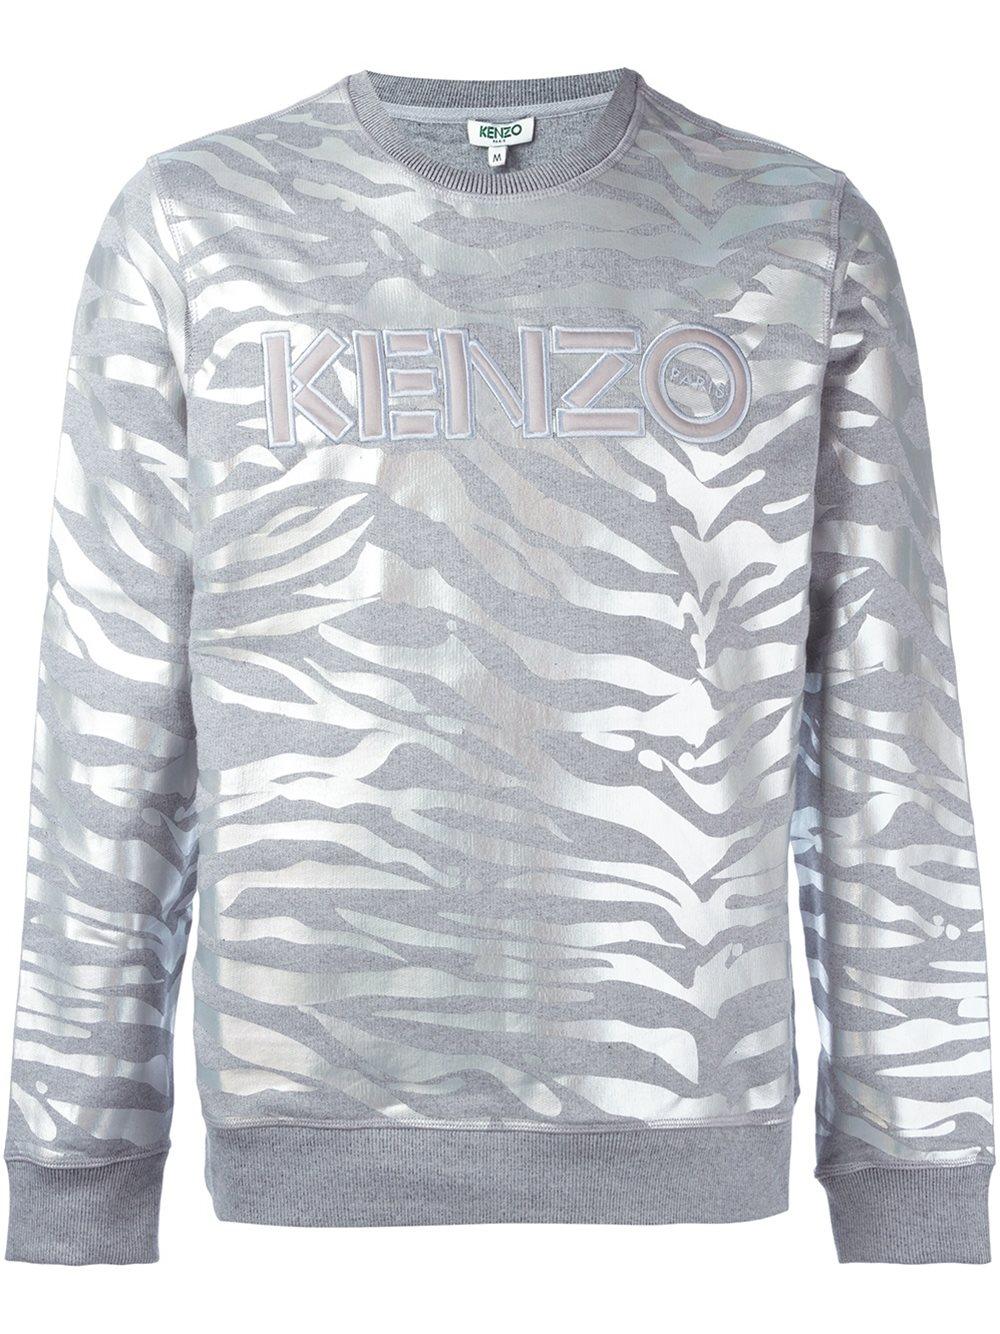 Stripes dernière Kenzo Tiger Clothing Homme Sweat Tiger sac AxUqxS